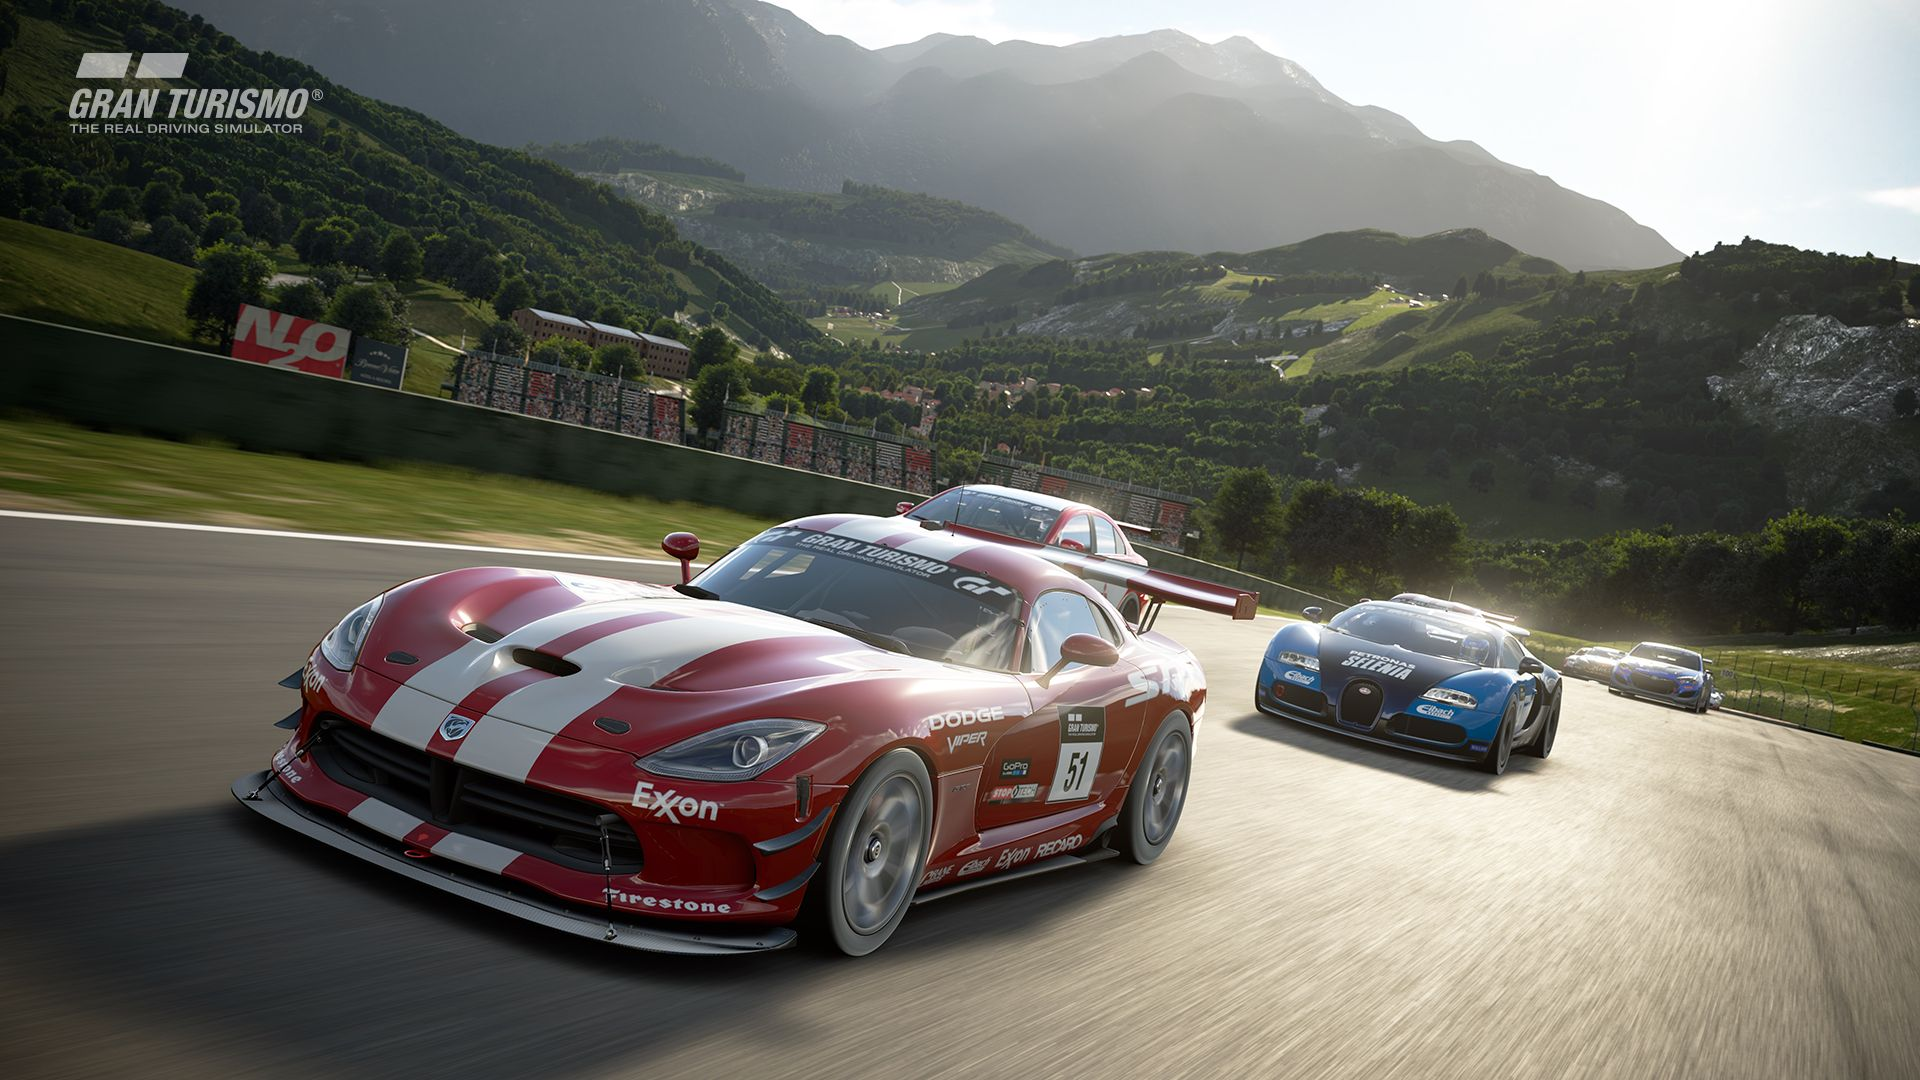 Gran Turismo Sport looks spellbinding in VR